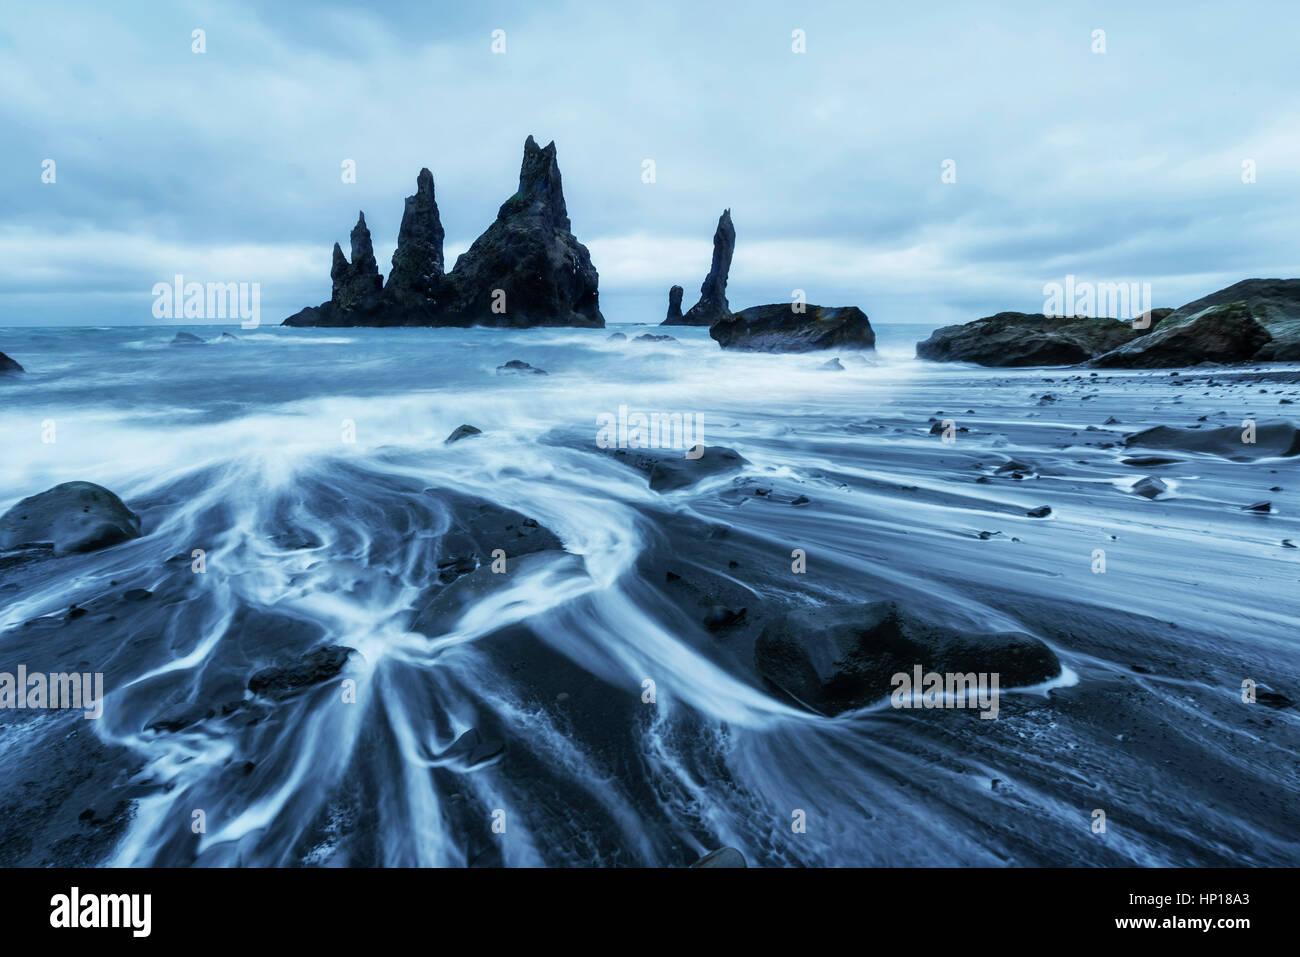 Die Rock-Troll-Zehen. Reynisdrangar Klippen. Schwarzen Sand Strand Stockbild